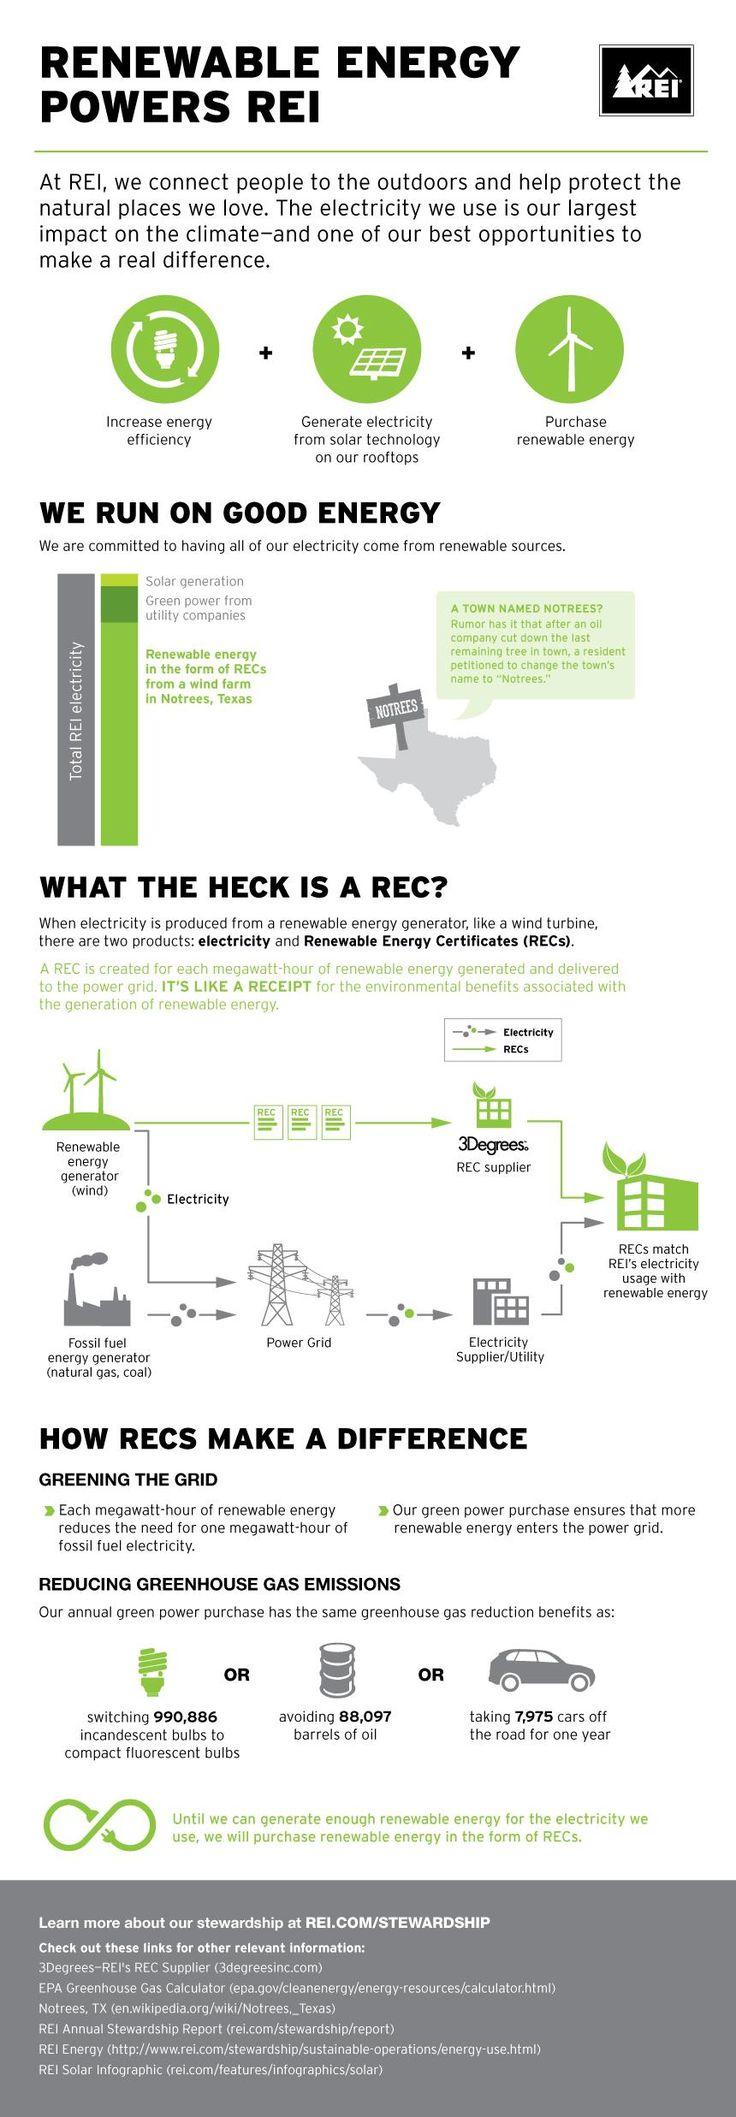 REI's green power strategy: renewable energy + solar generation + renewable energy certificates (RECs).